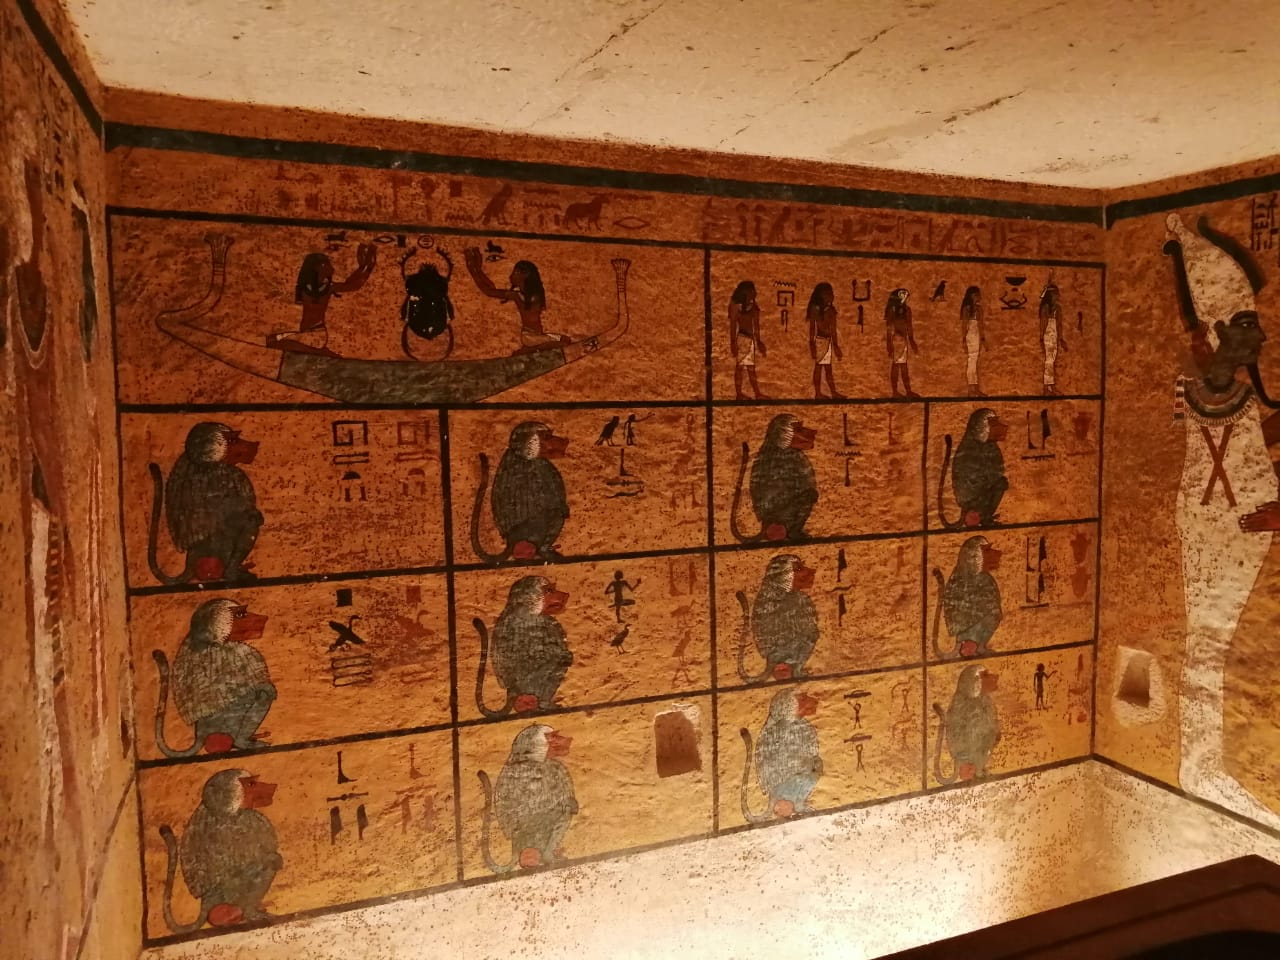 Inside the tomb of Tutankhamon